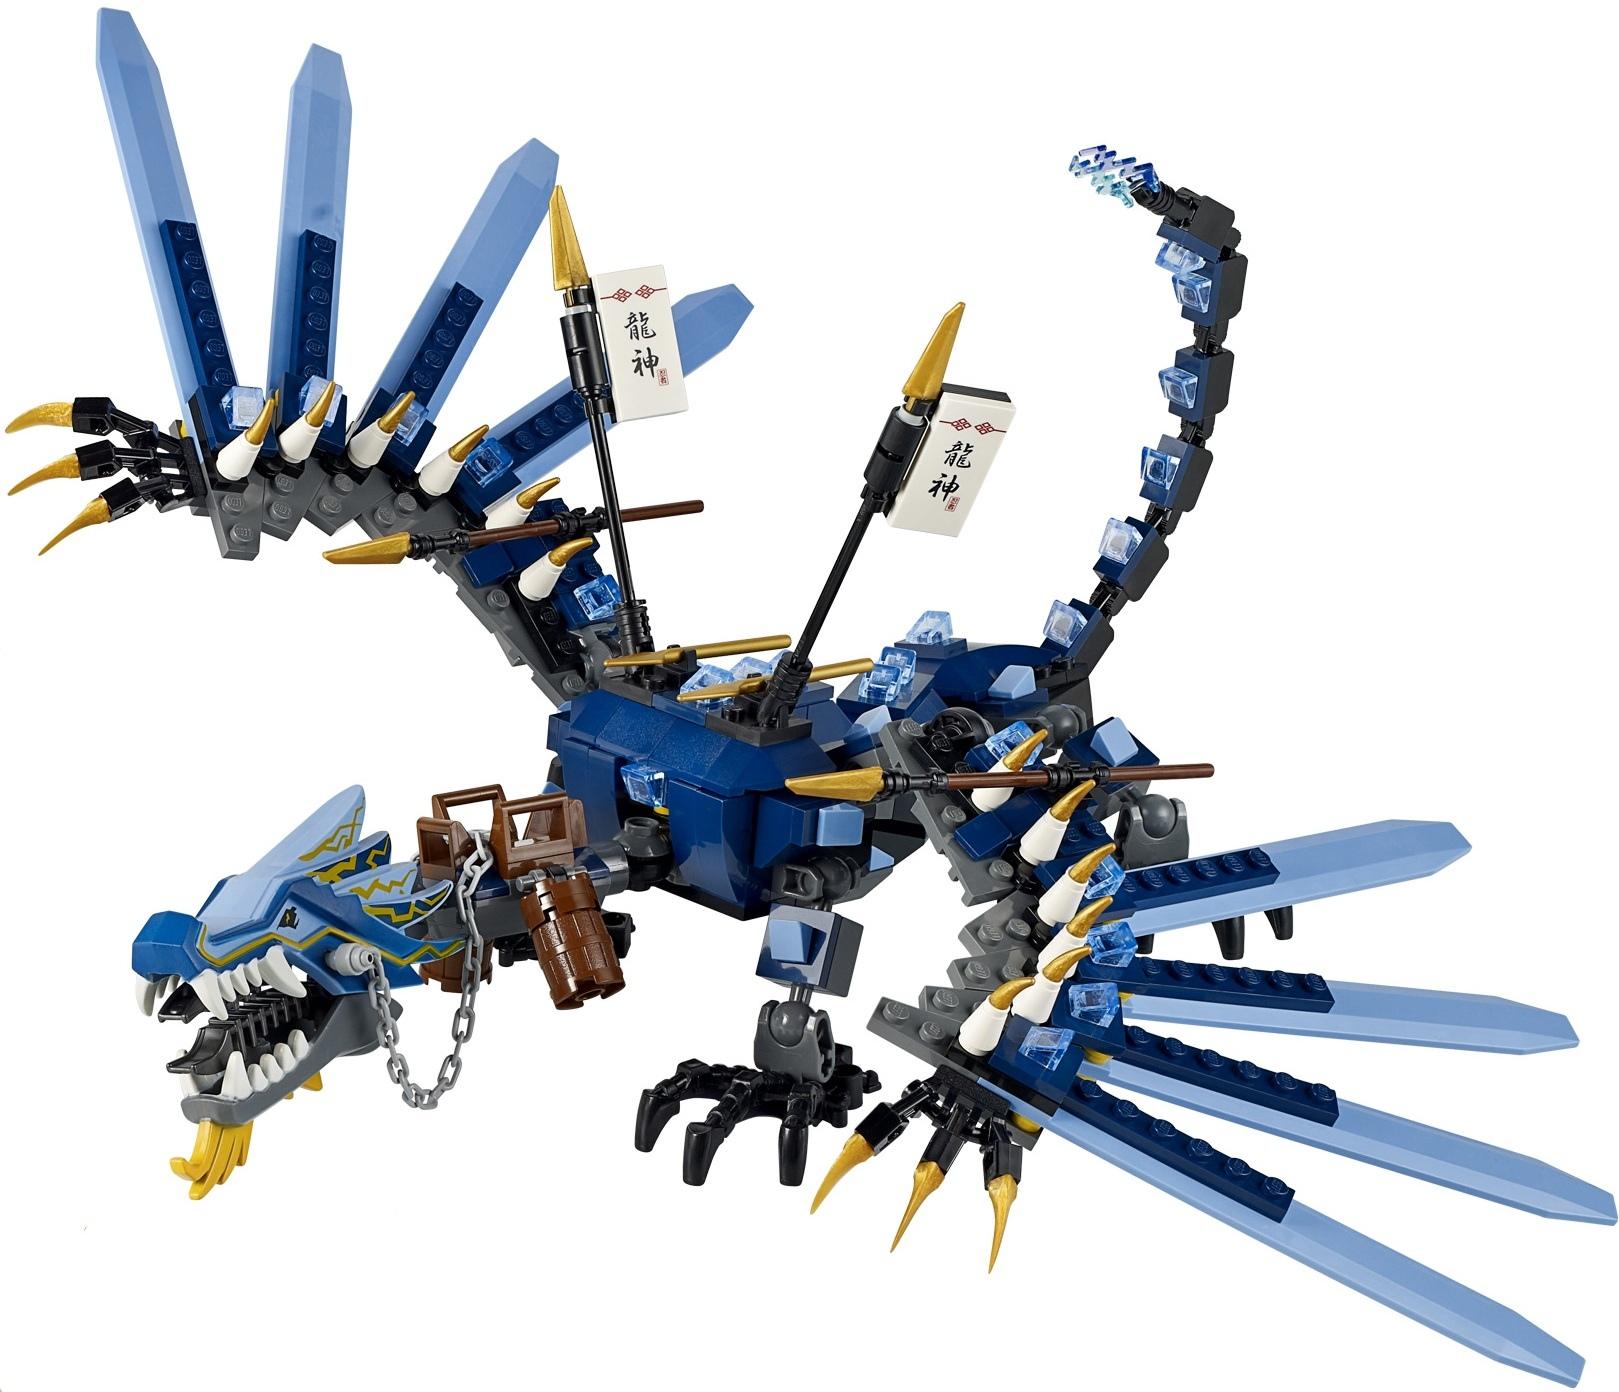 Image 2521 brickipedia the lego wiki - Dragon ninjago lego ...